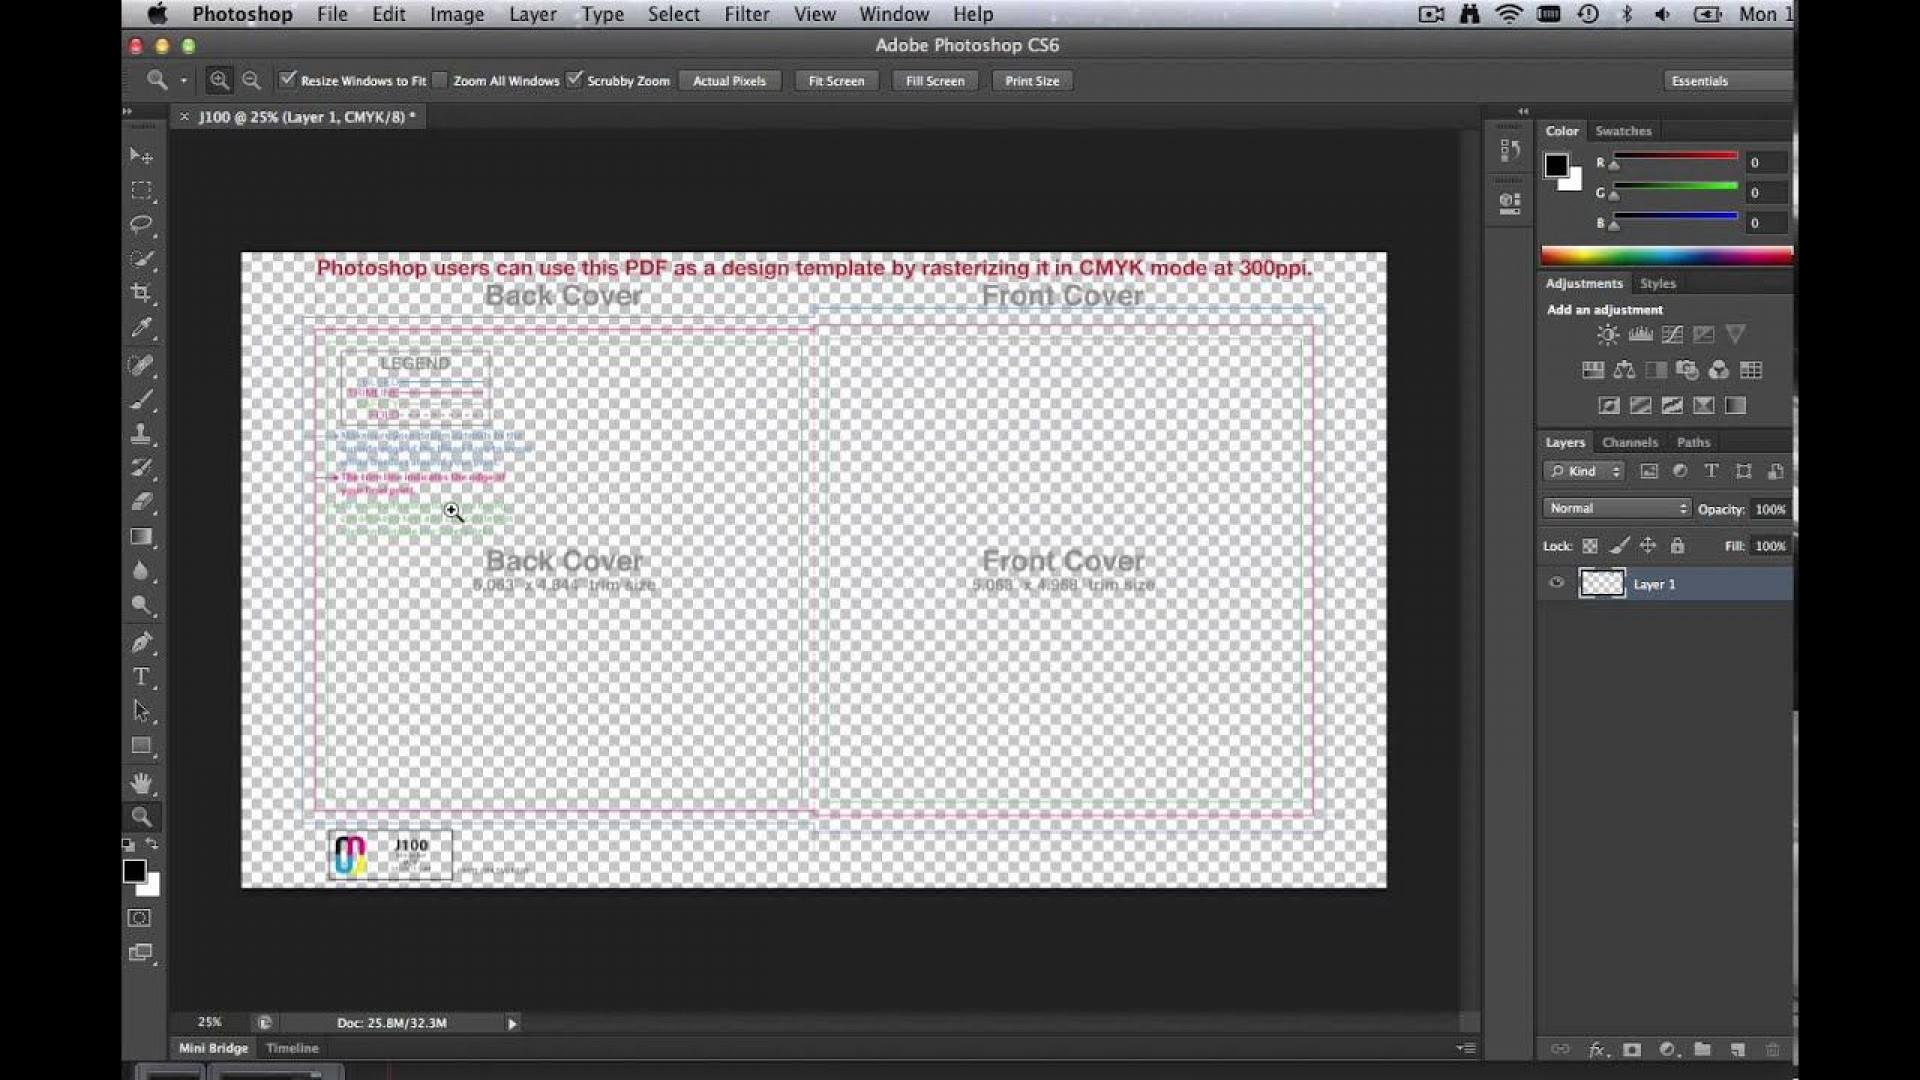 007 Unique Cd Cover Design Template Photoshop High Def  Label Psd Free1920